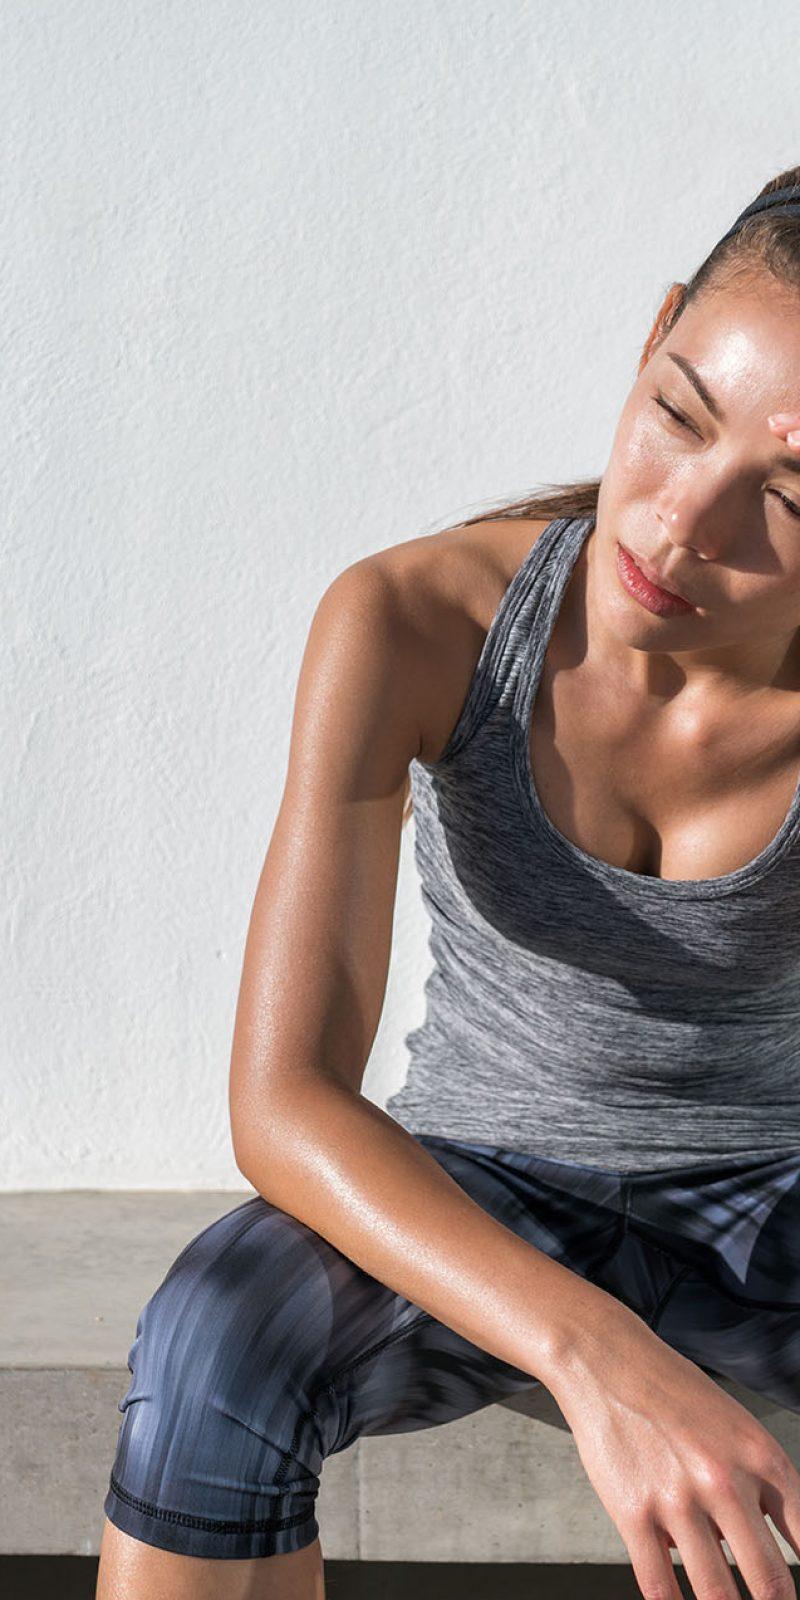 fitness verlieren wie lange dauert es bis man muskeln verliert. Black Bedroom Furniture Sets. Home Design Ideas